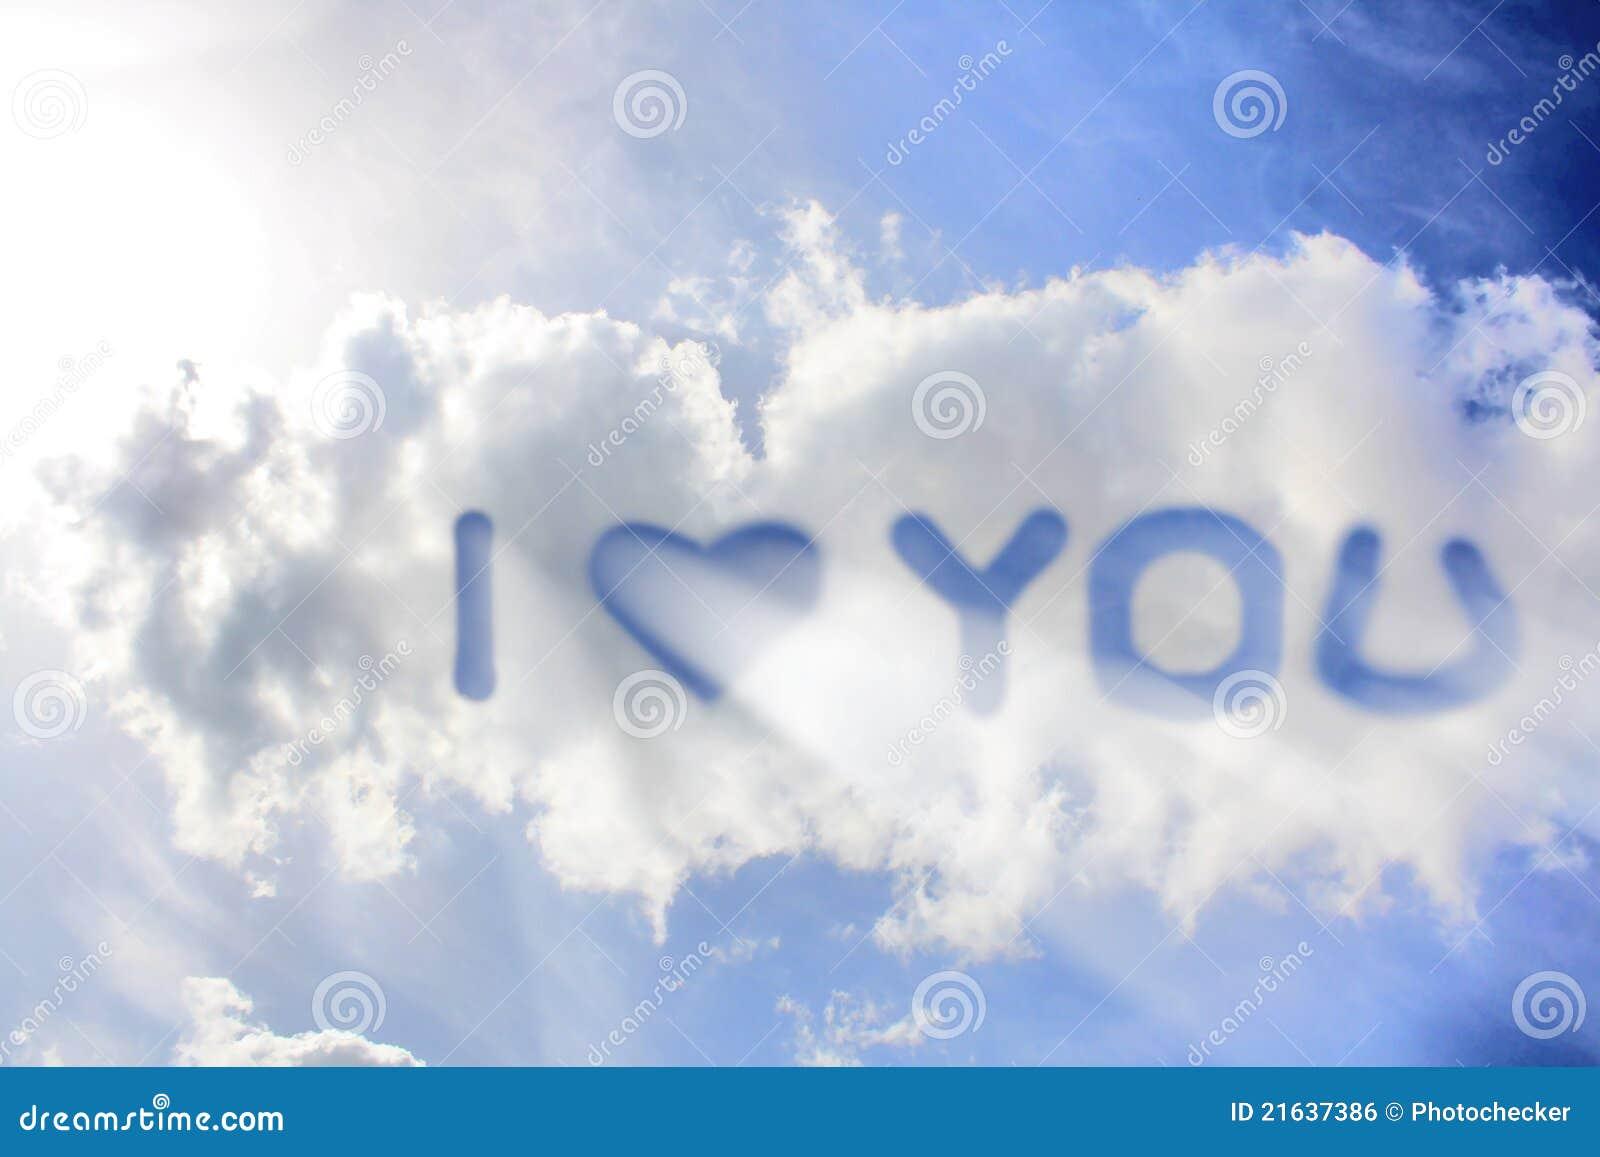 I Love You Imágenes De Stock I Love You Fotos De Stock: I Love You Royalty Free Stock Image